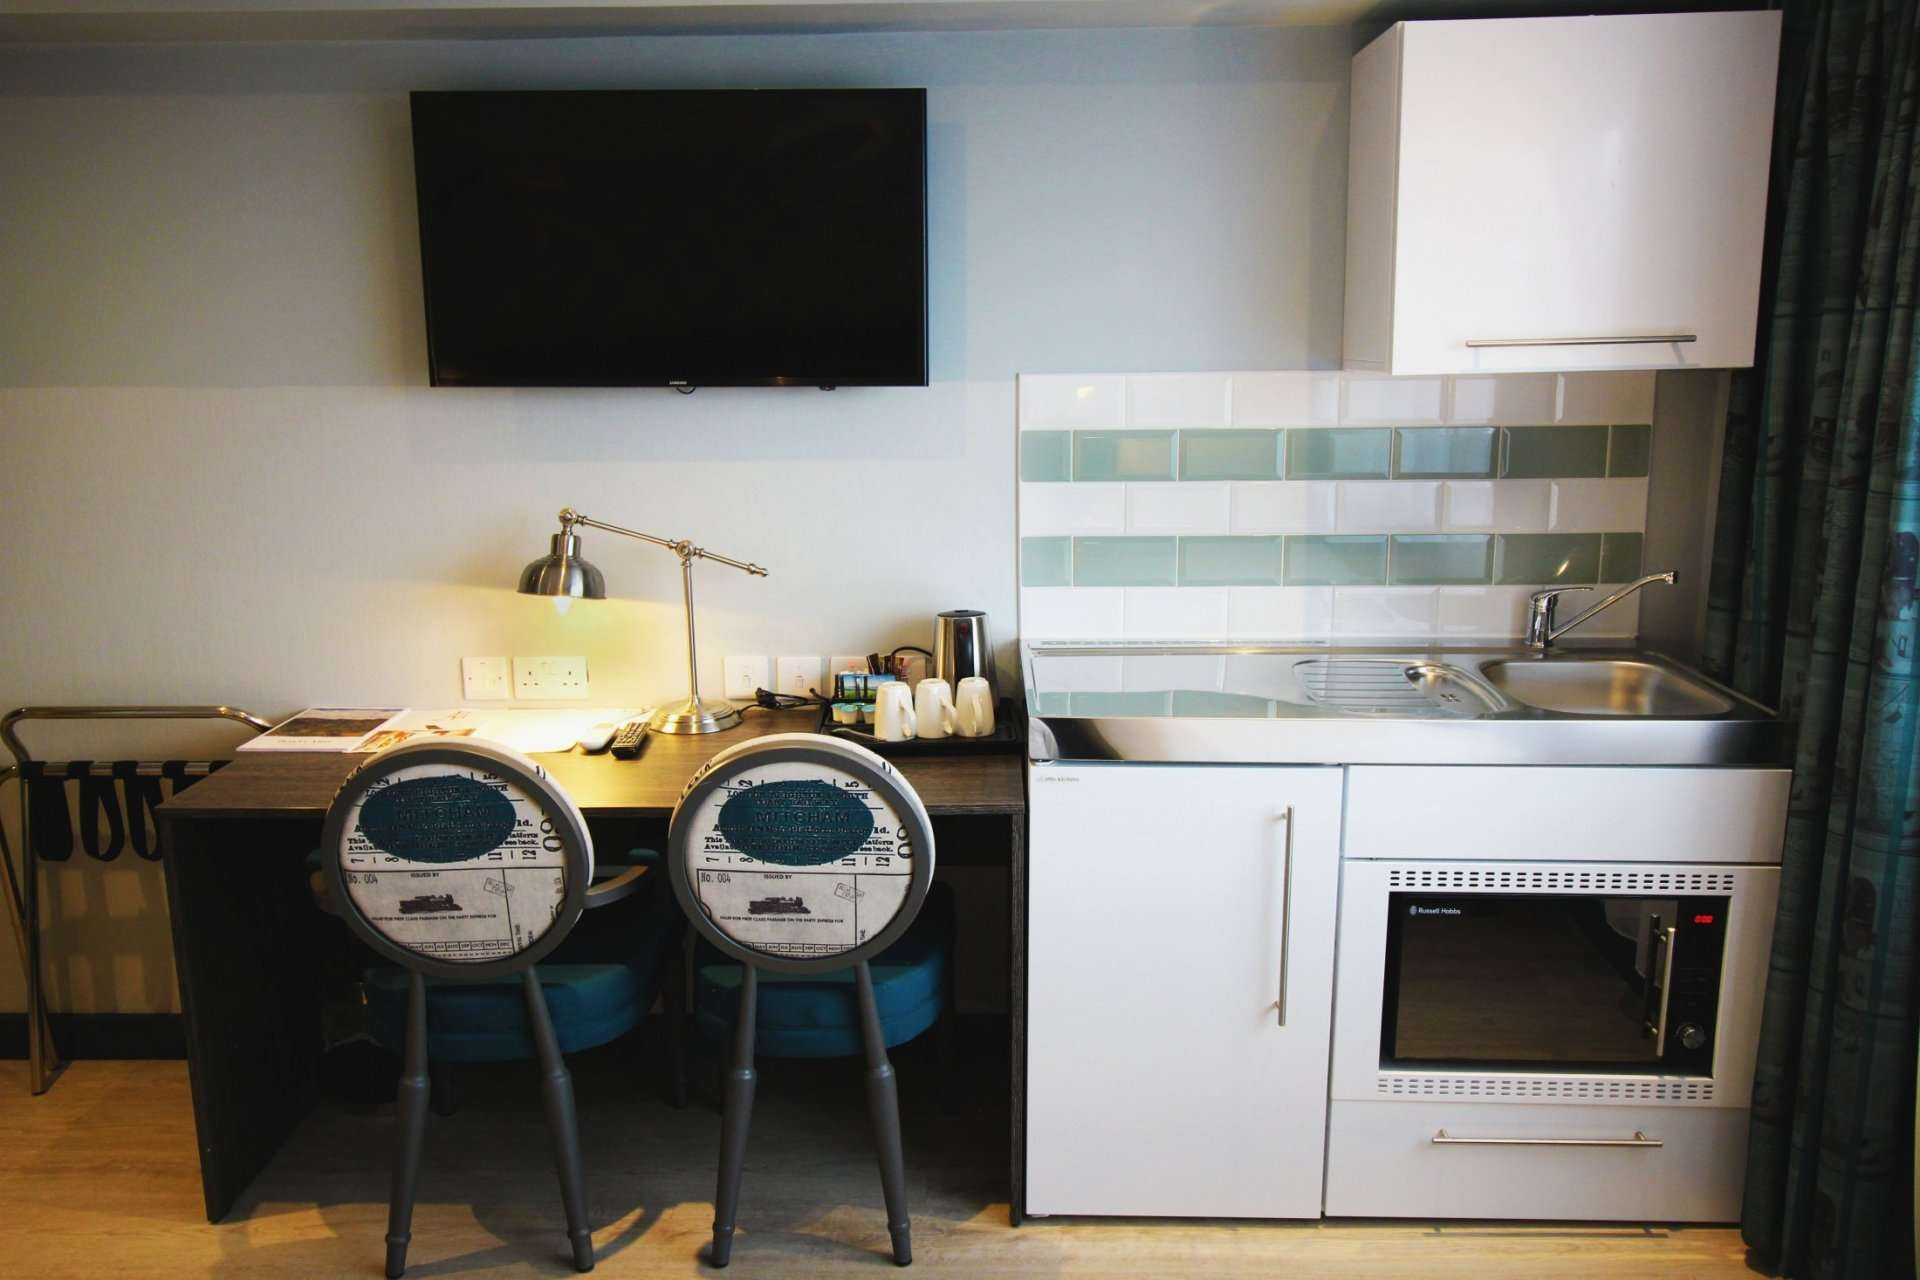 shared kitchenette at The London Croydon Aparthotel